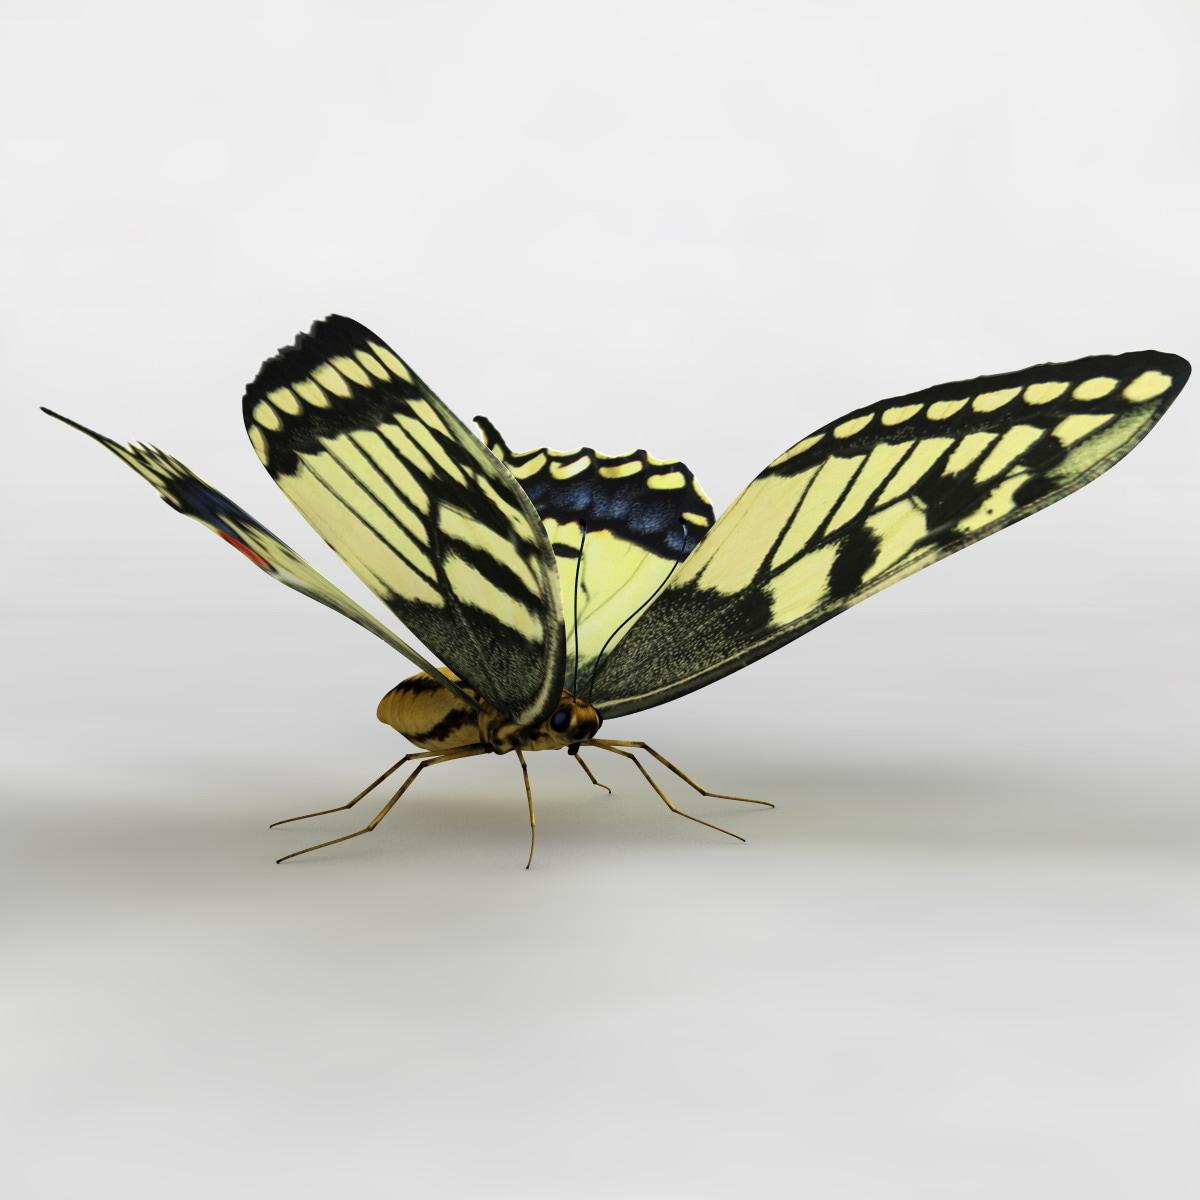 tiger swallowtail butterfly 3d model